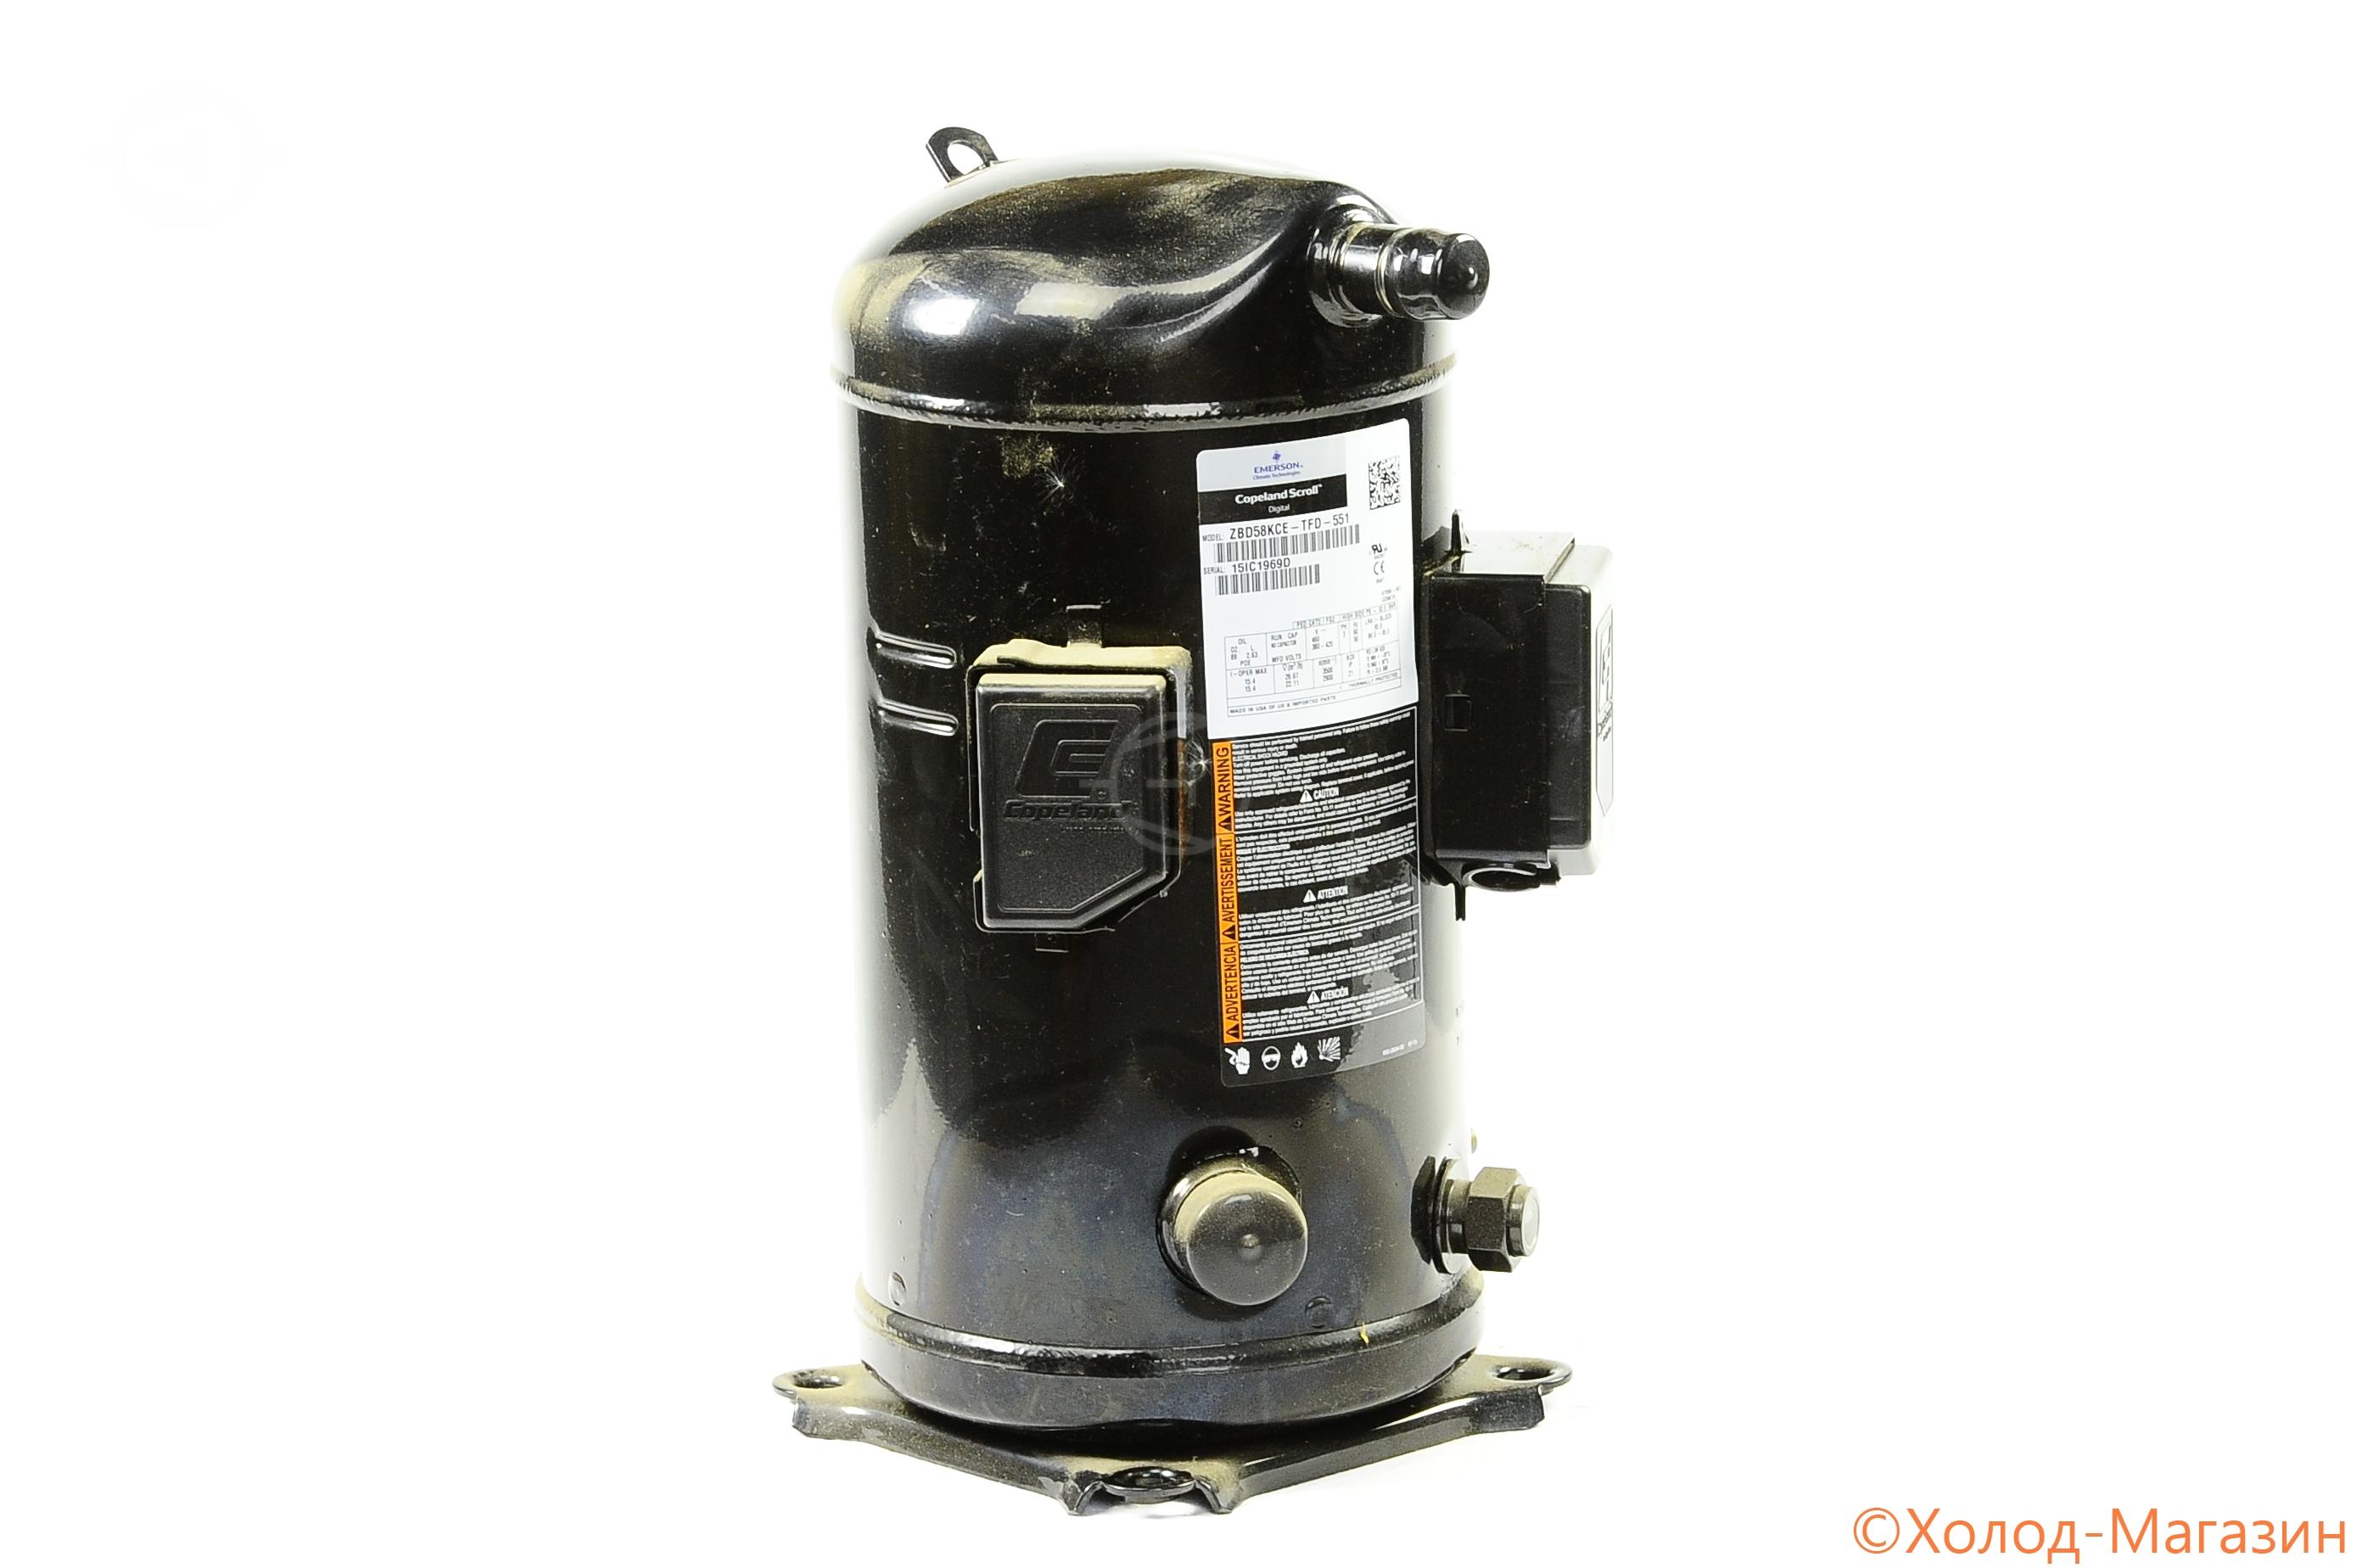 Компрессор спиральный ZBD 58 KCE-TFD-551 Copeland, Emerson